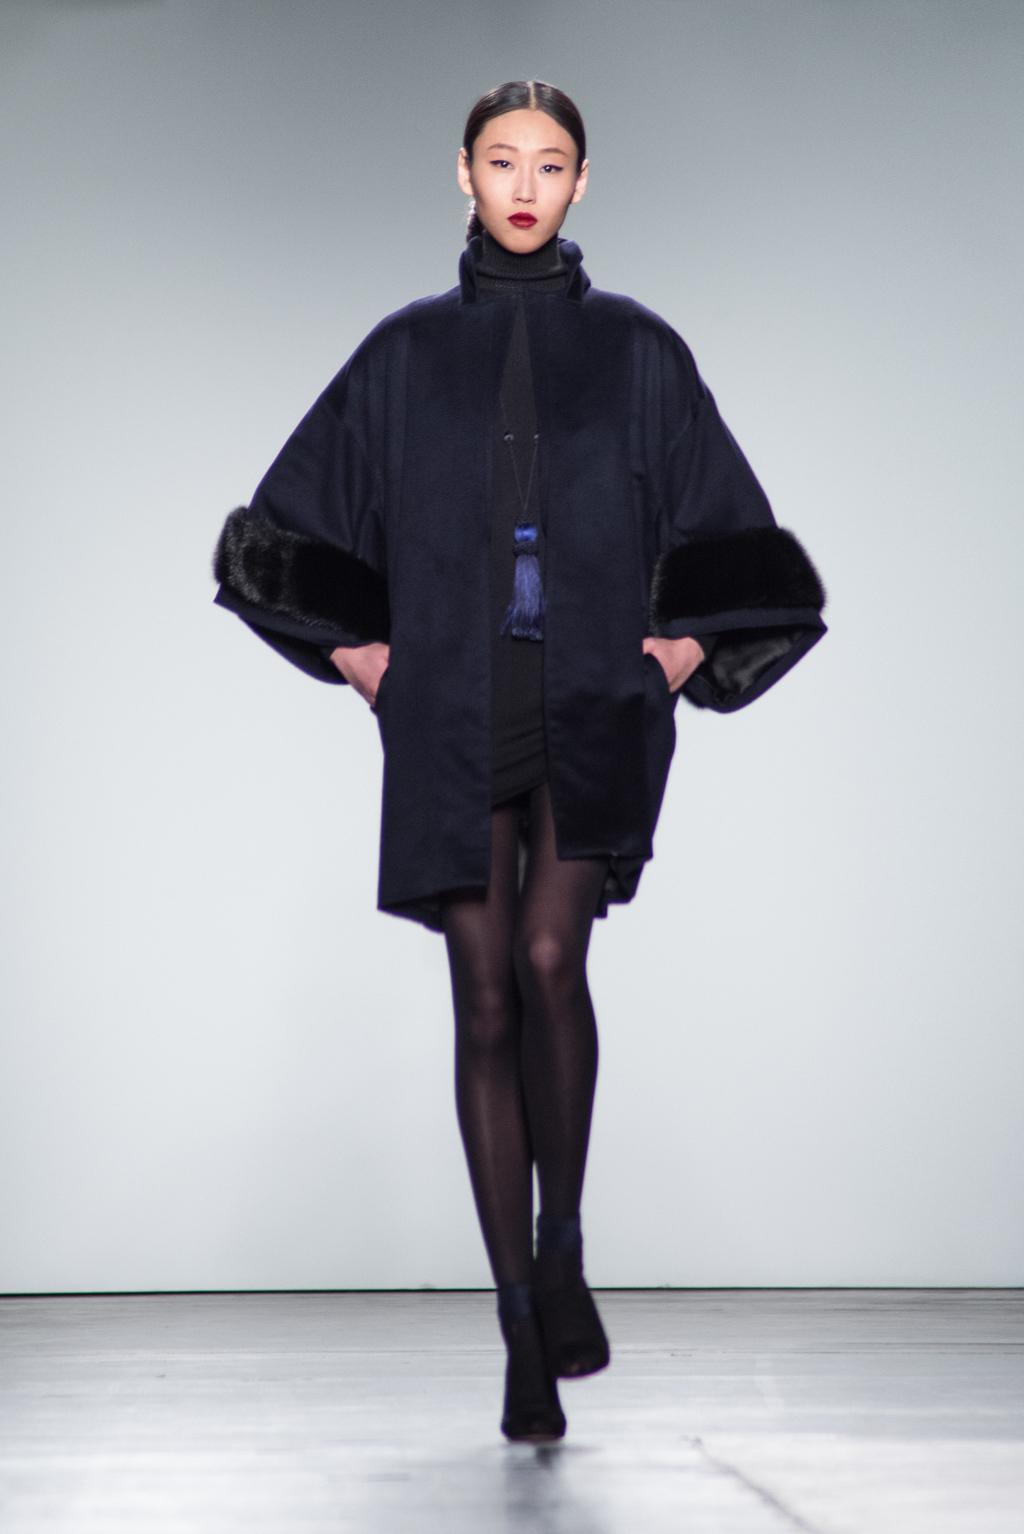 NYFW AW17 - Zang Toi - Stephanie BC - The Upcoming - 1